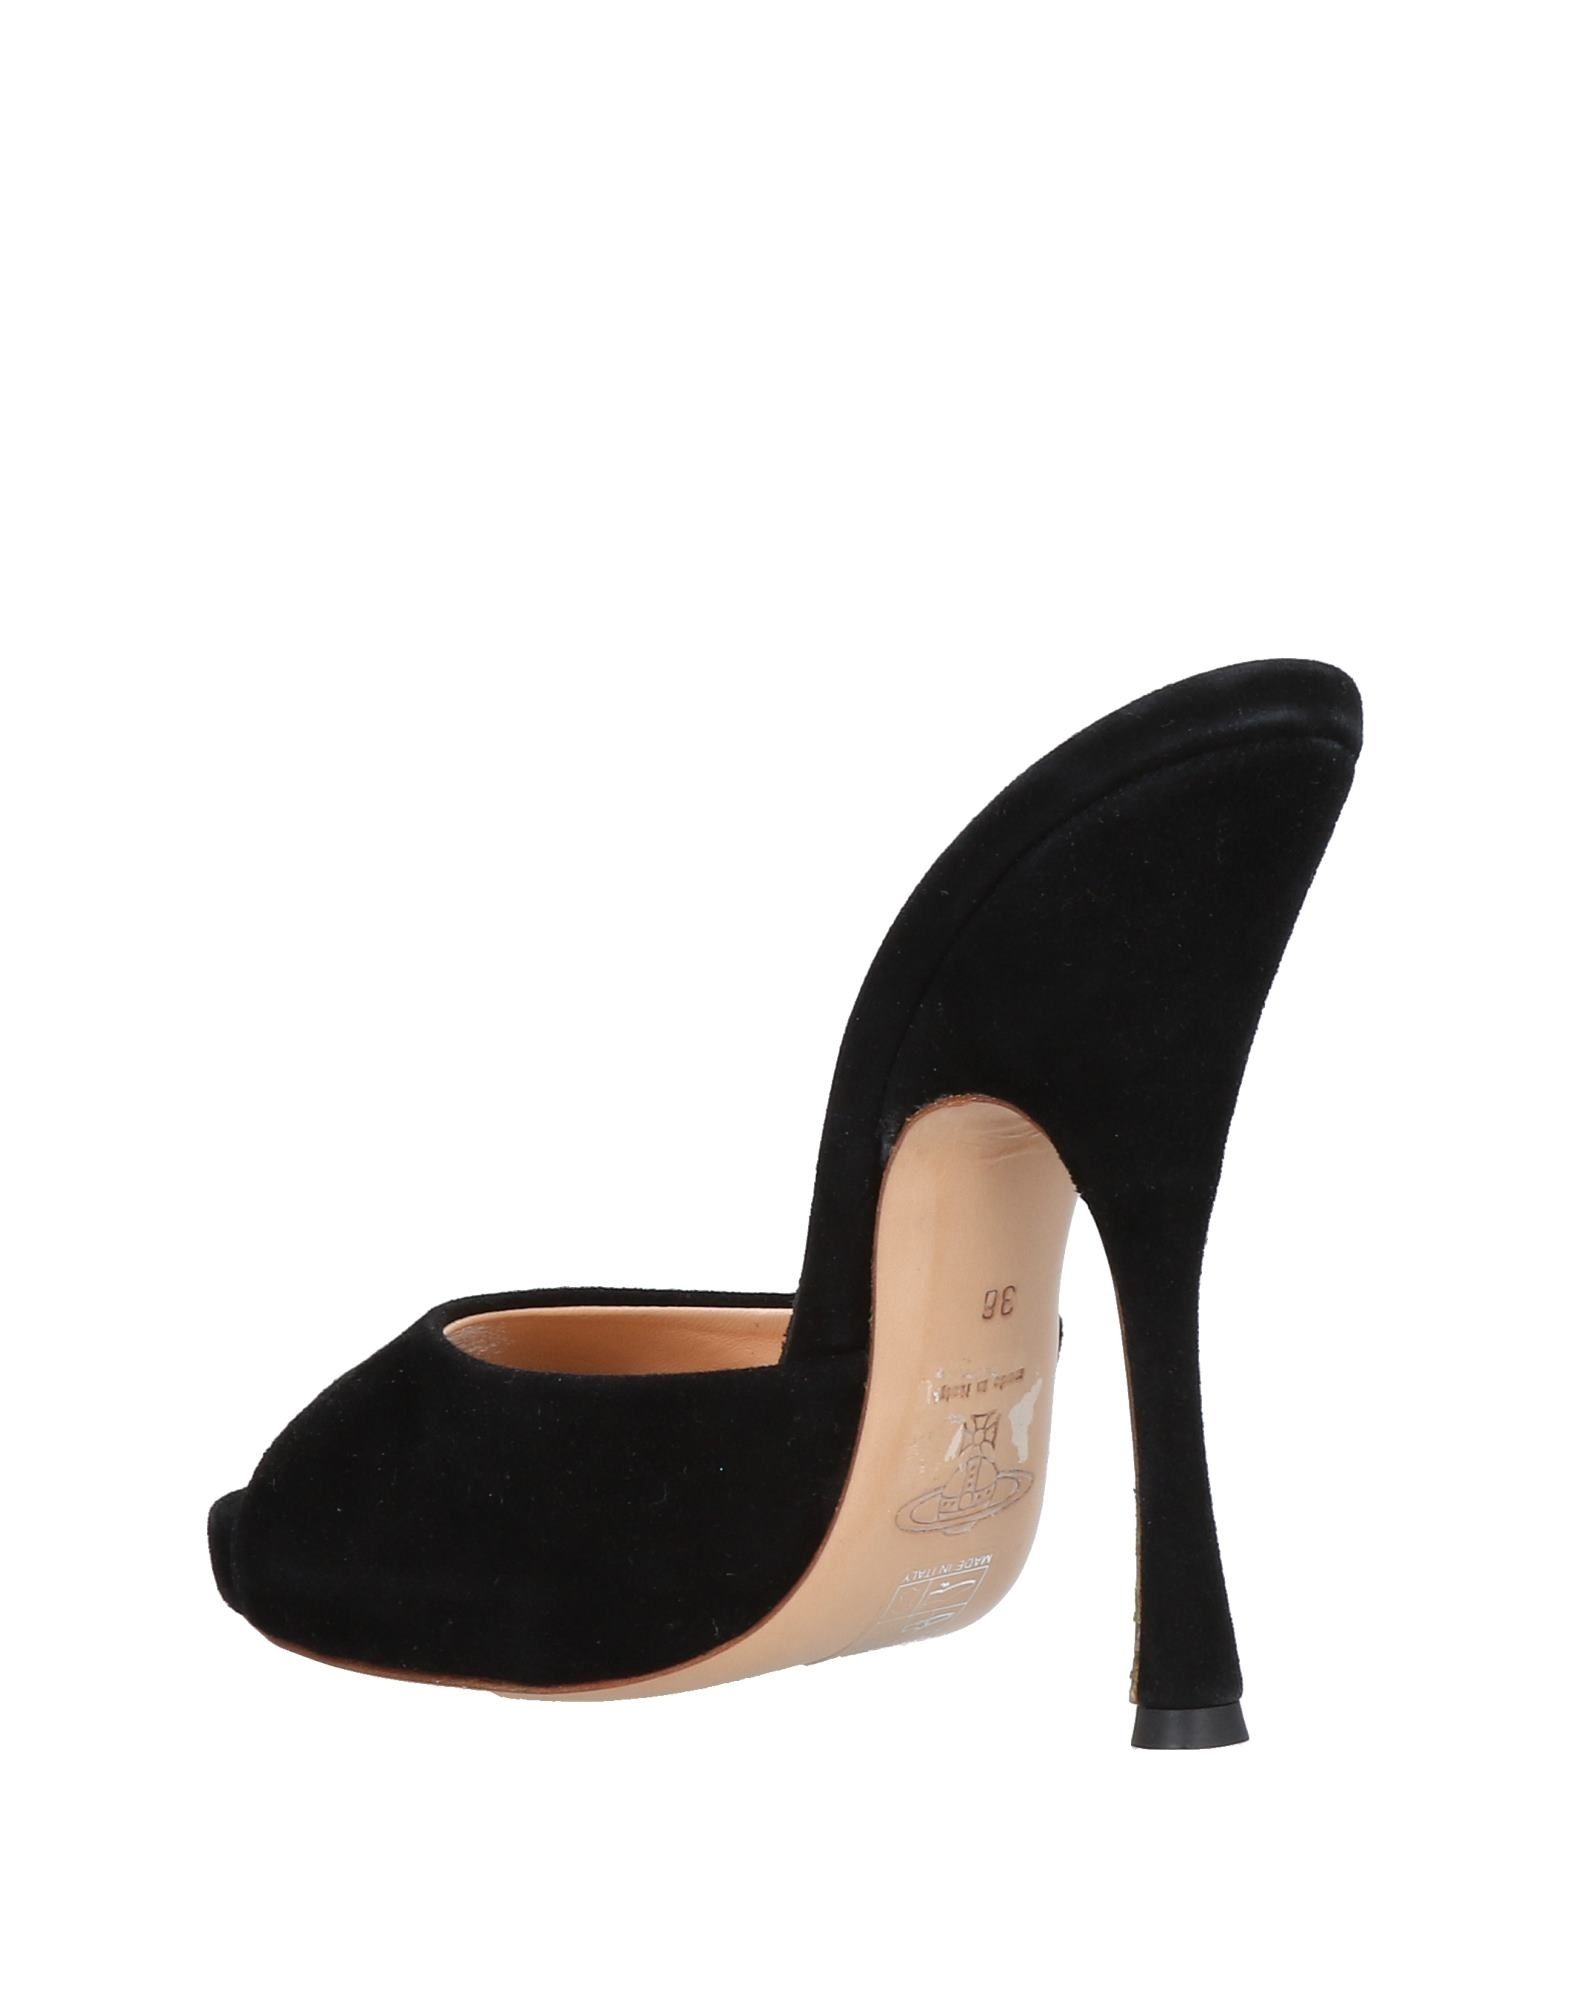 Stilvolle billige Schuhe Vivienne Westwood 11486828OC Sandalen Damen  11486828OC Westwood e8d72e